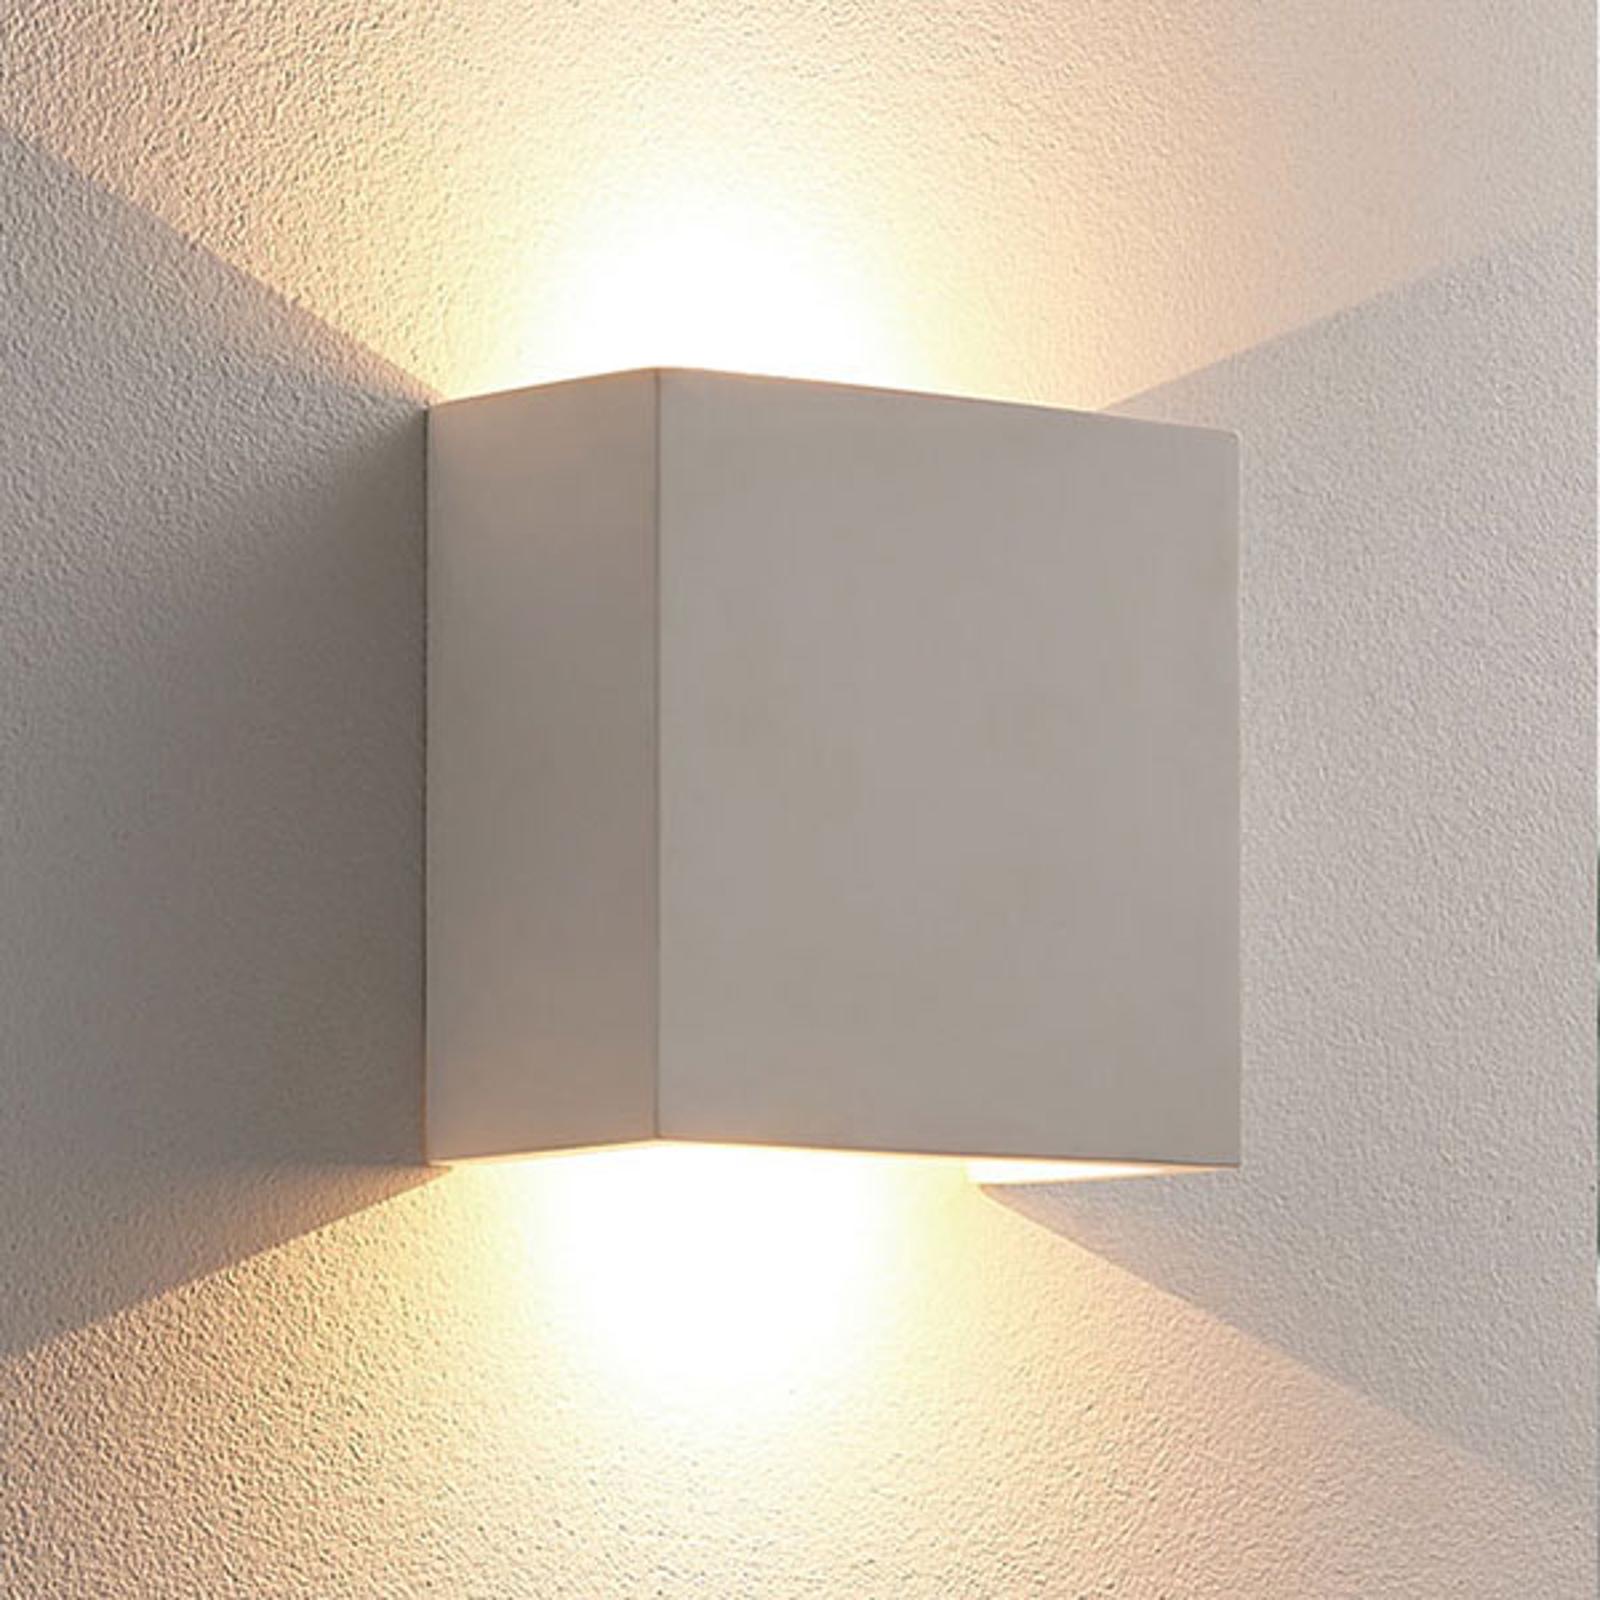 Anneke - eckige LED-Wandleuchte aus Gips